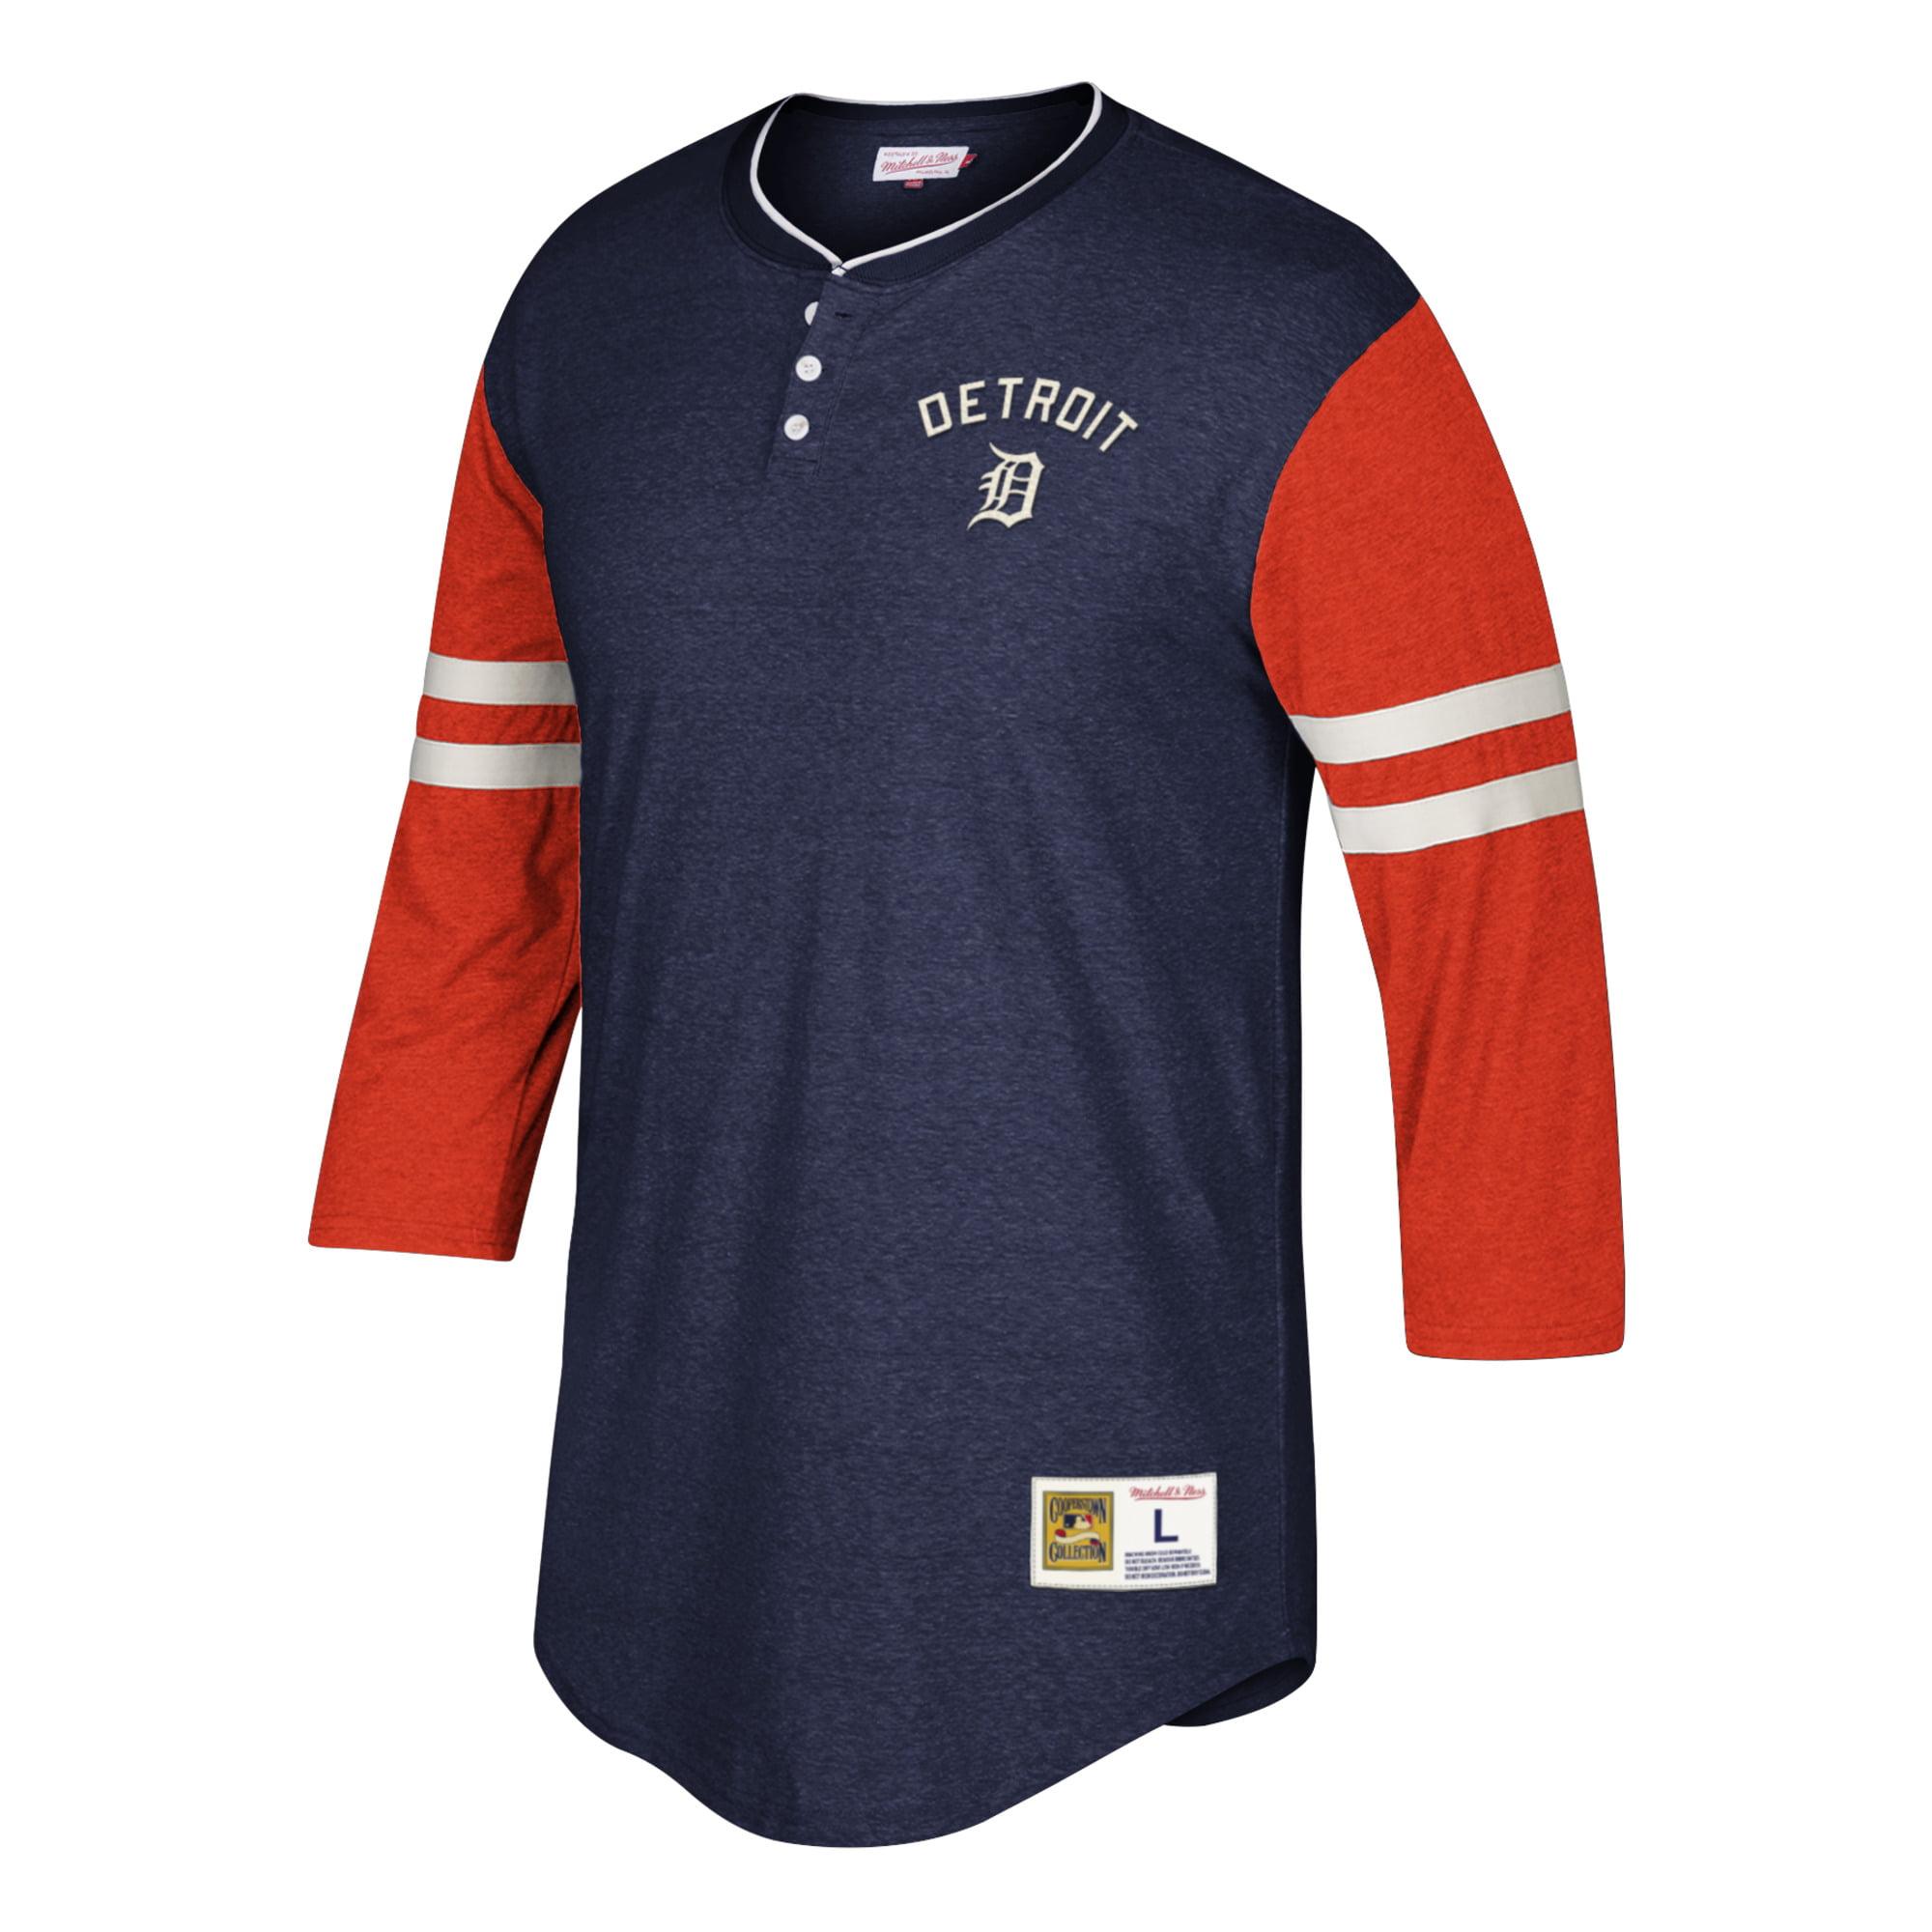 Detroit Tigers Mitchell & Ness Home Stretch 3/4-Sleeve Henley T-Shirt - Navy/Orange